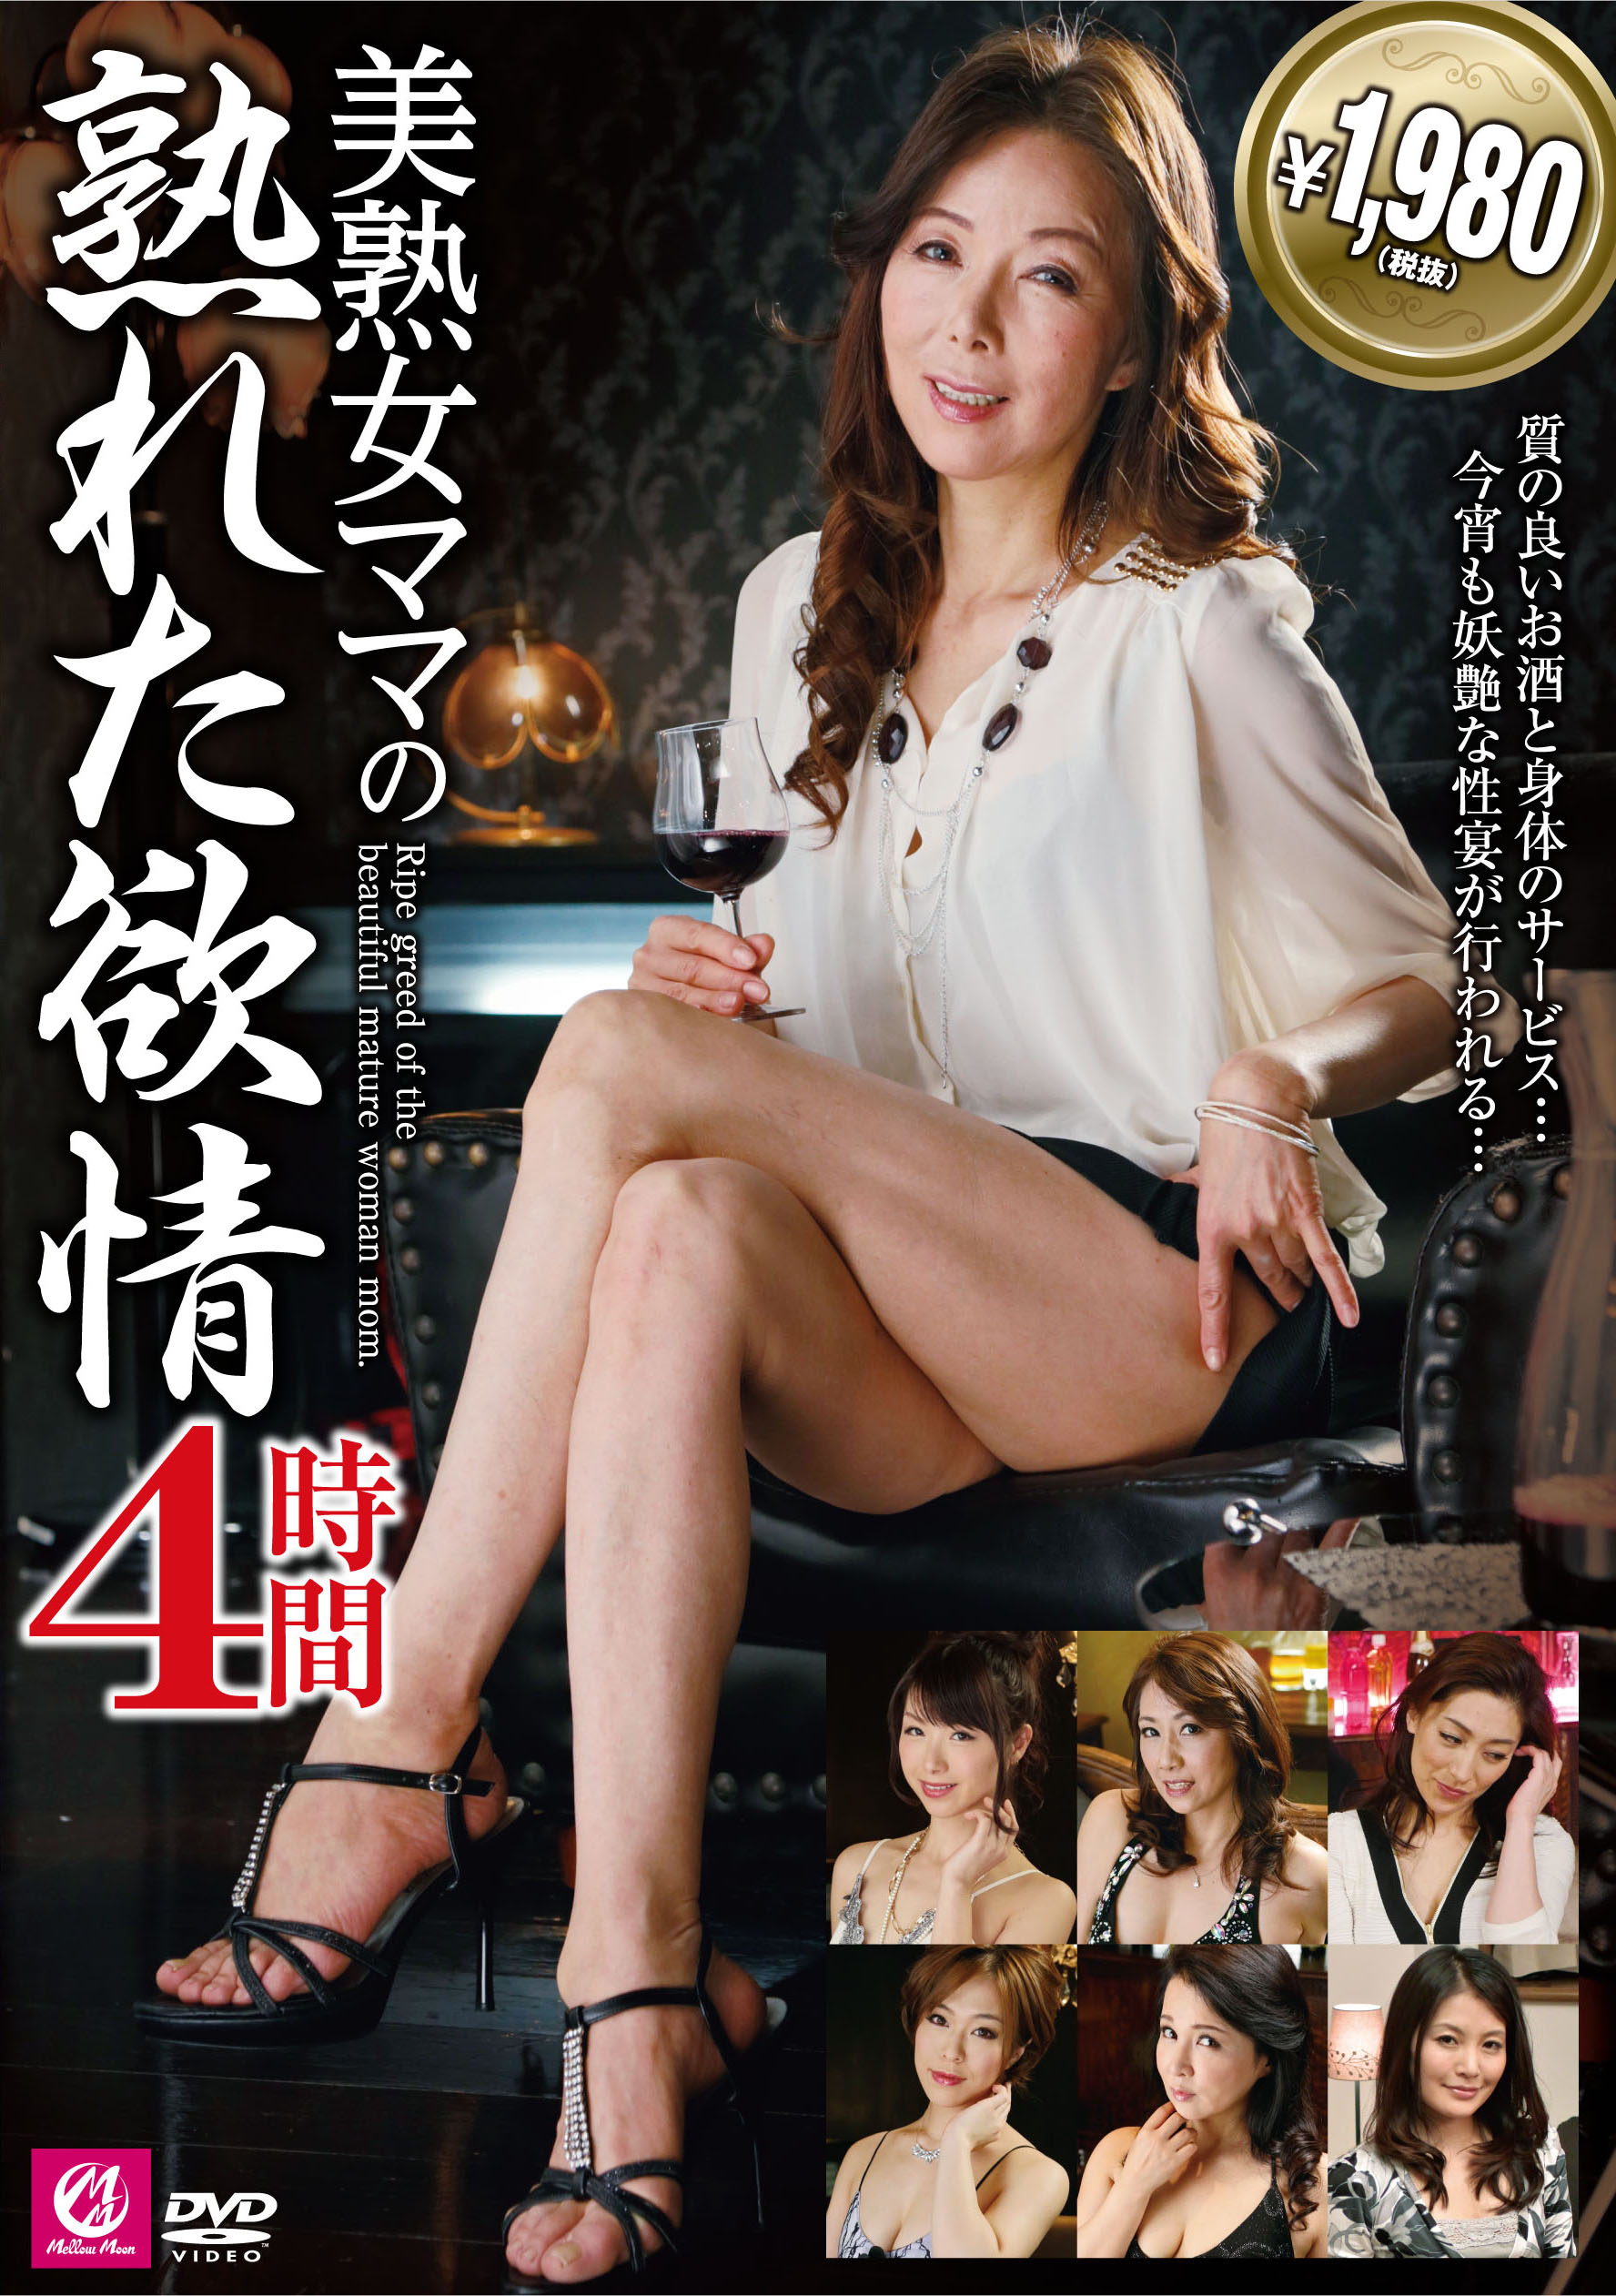 MLW-5038_JK_2_OL